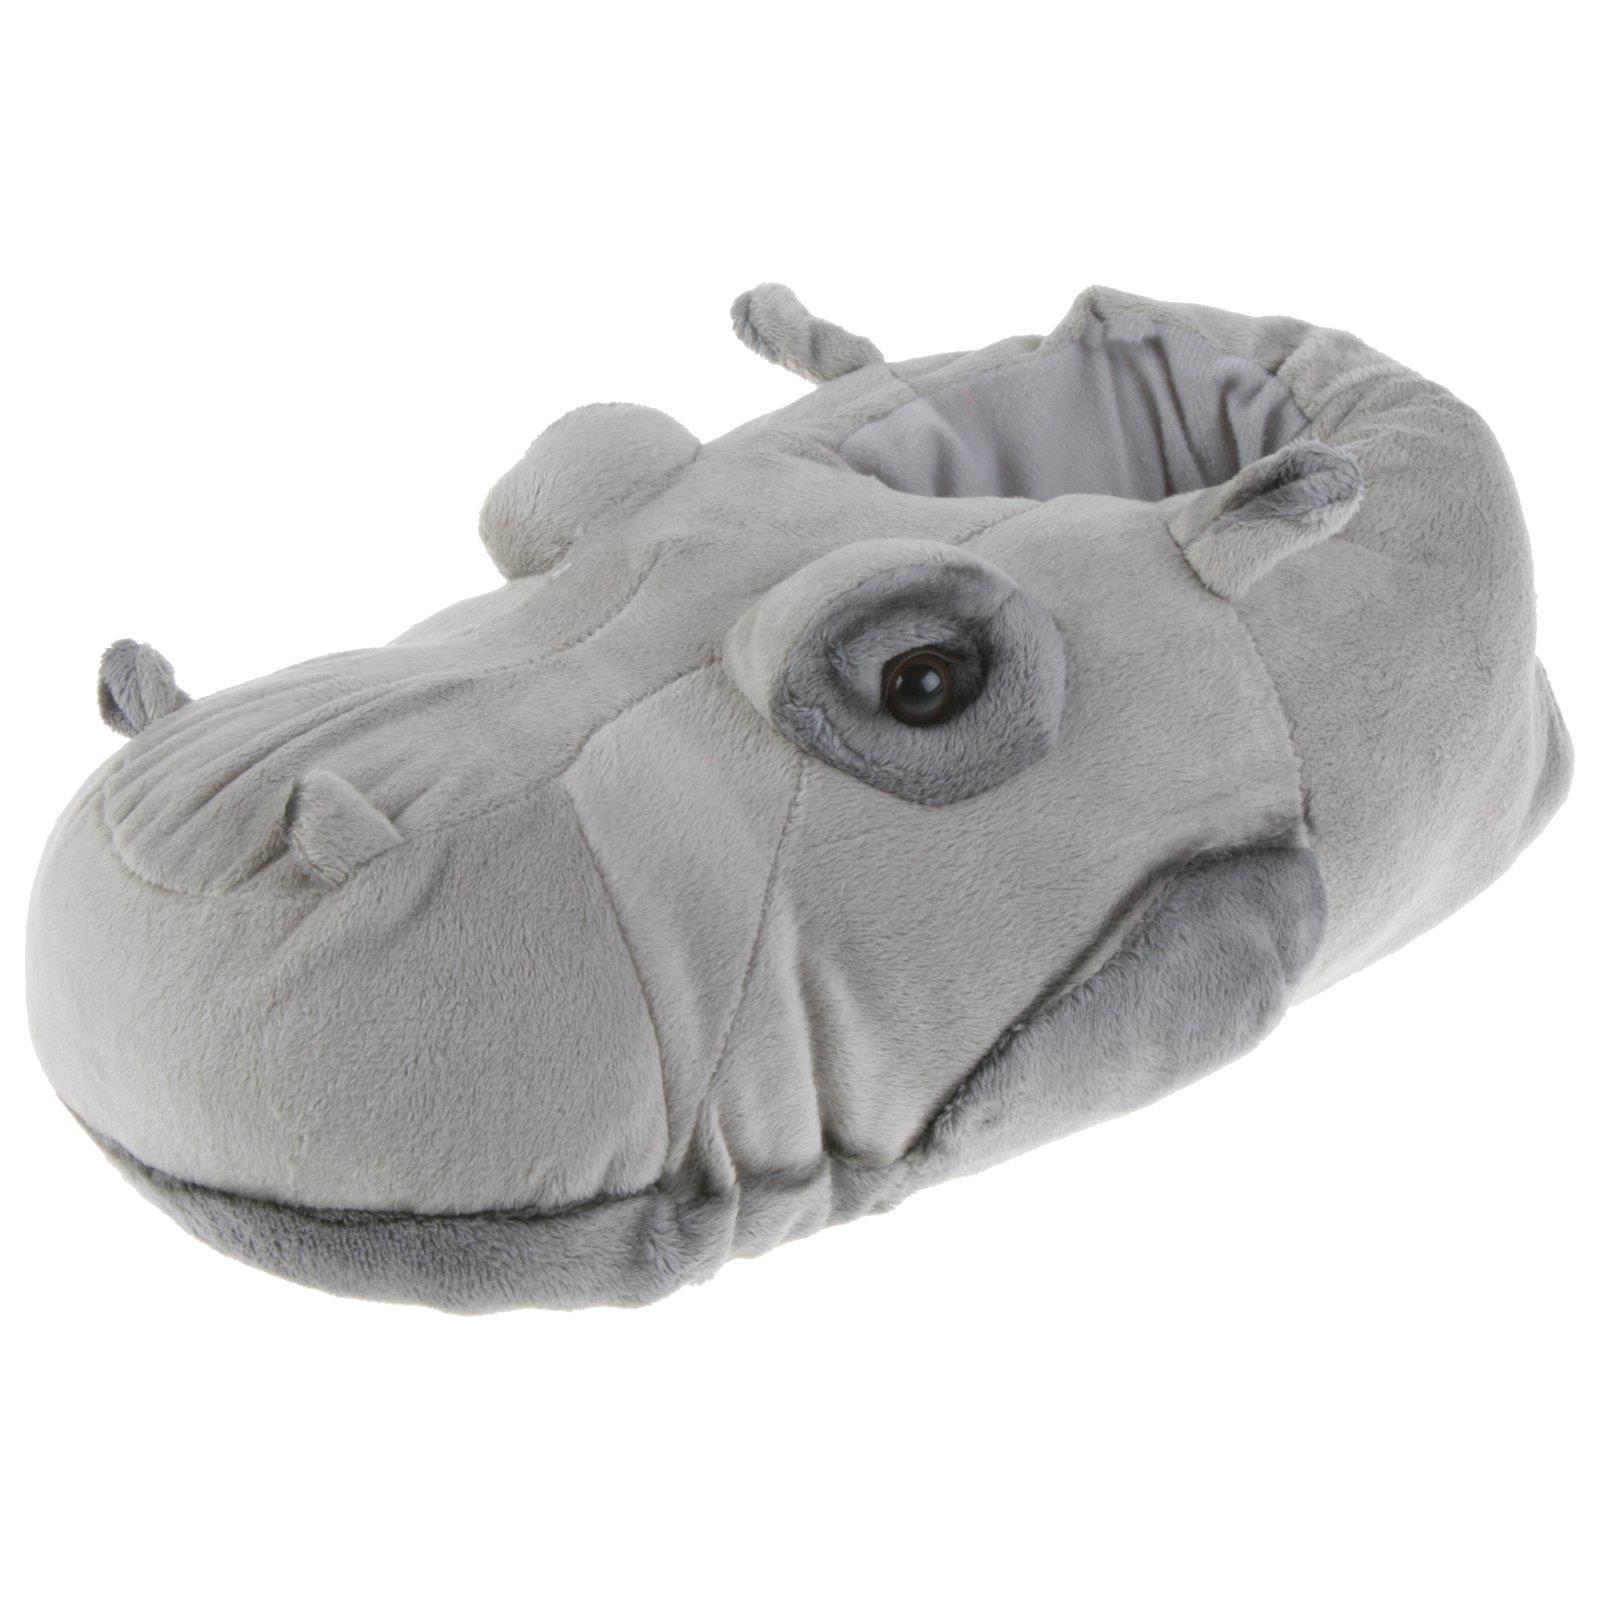 Flusspferd-Hippo-Tier-Hausschuhe-Pantoffel-Schlappen-Nilpferd-Pluesch-36-48 Indexbild 7